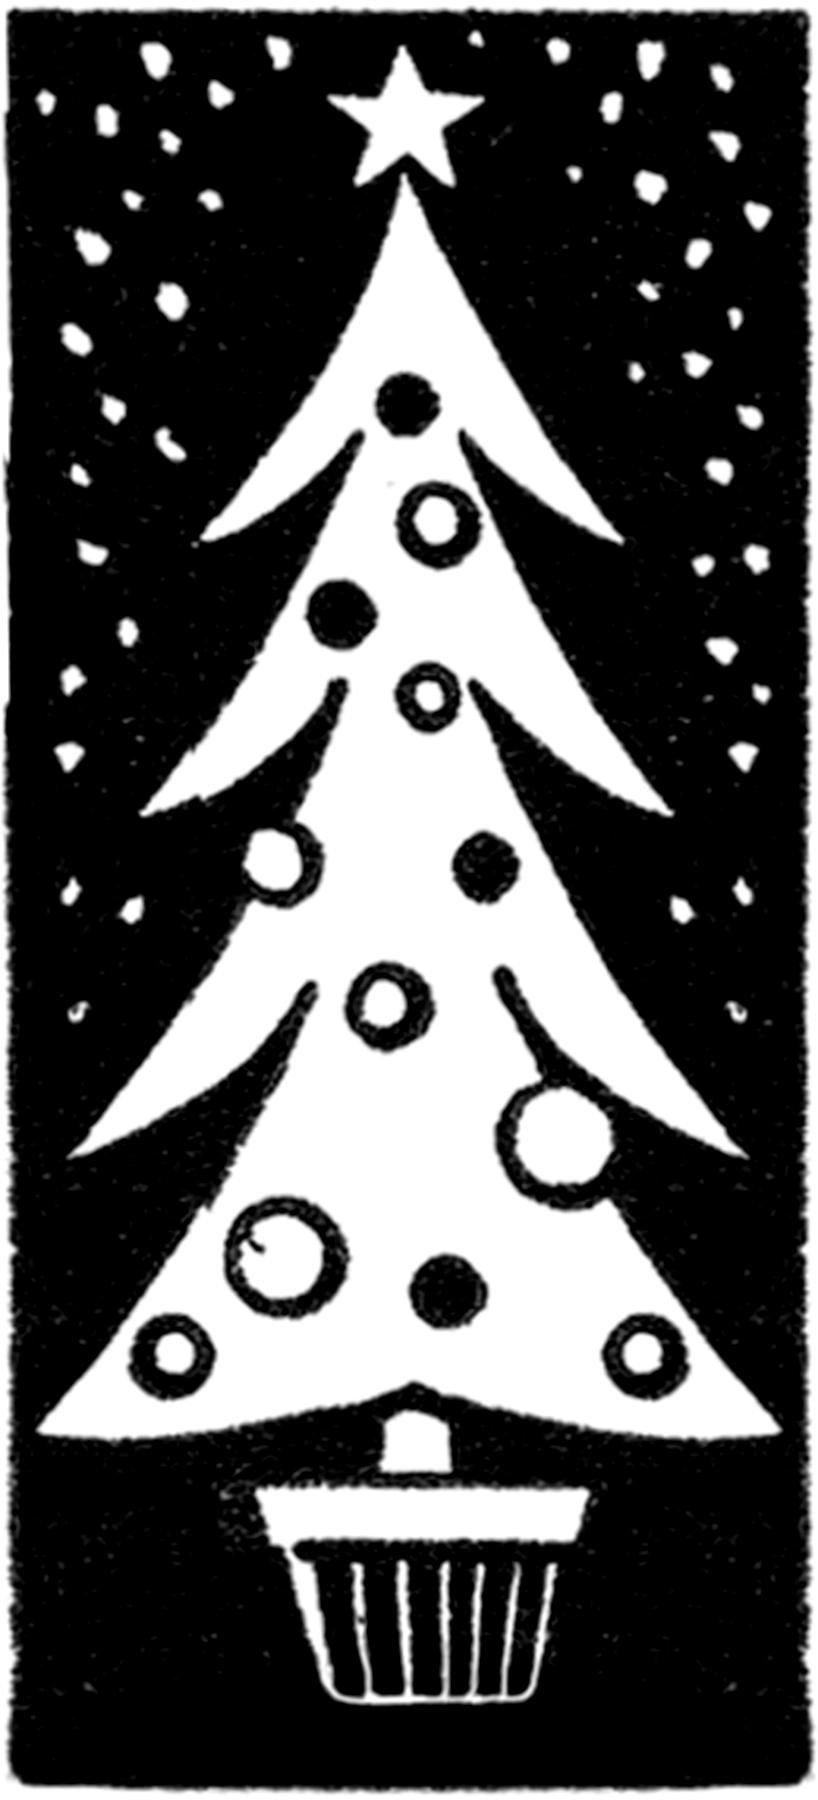 Tall Christmas Tree Clipart.Funky Retro Christmas Tree The Graphics Fairy